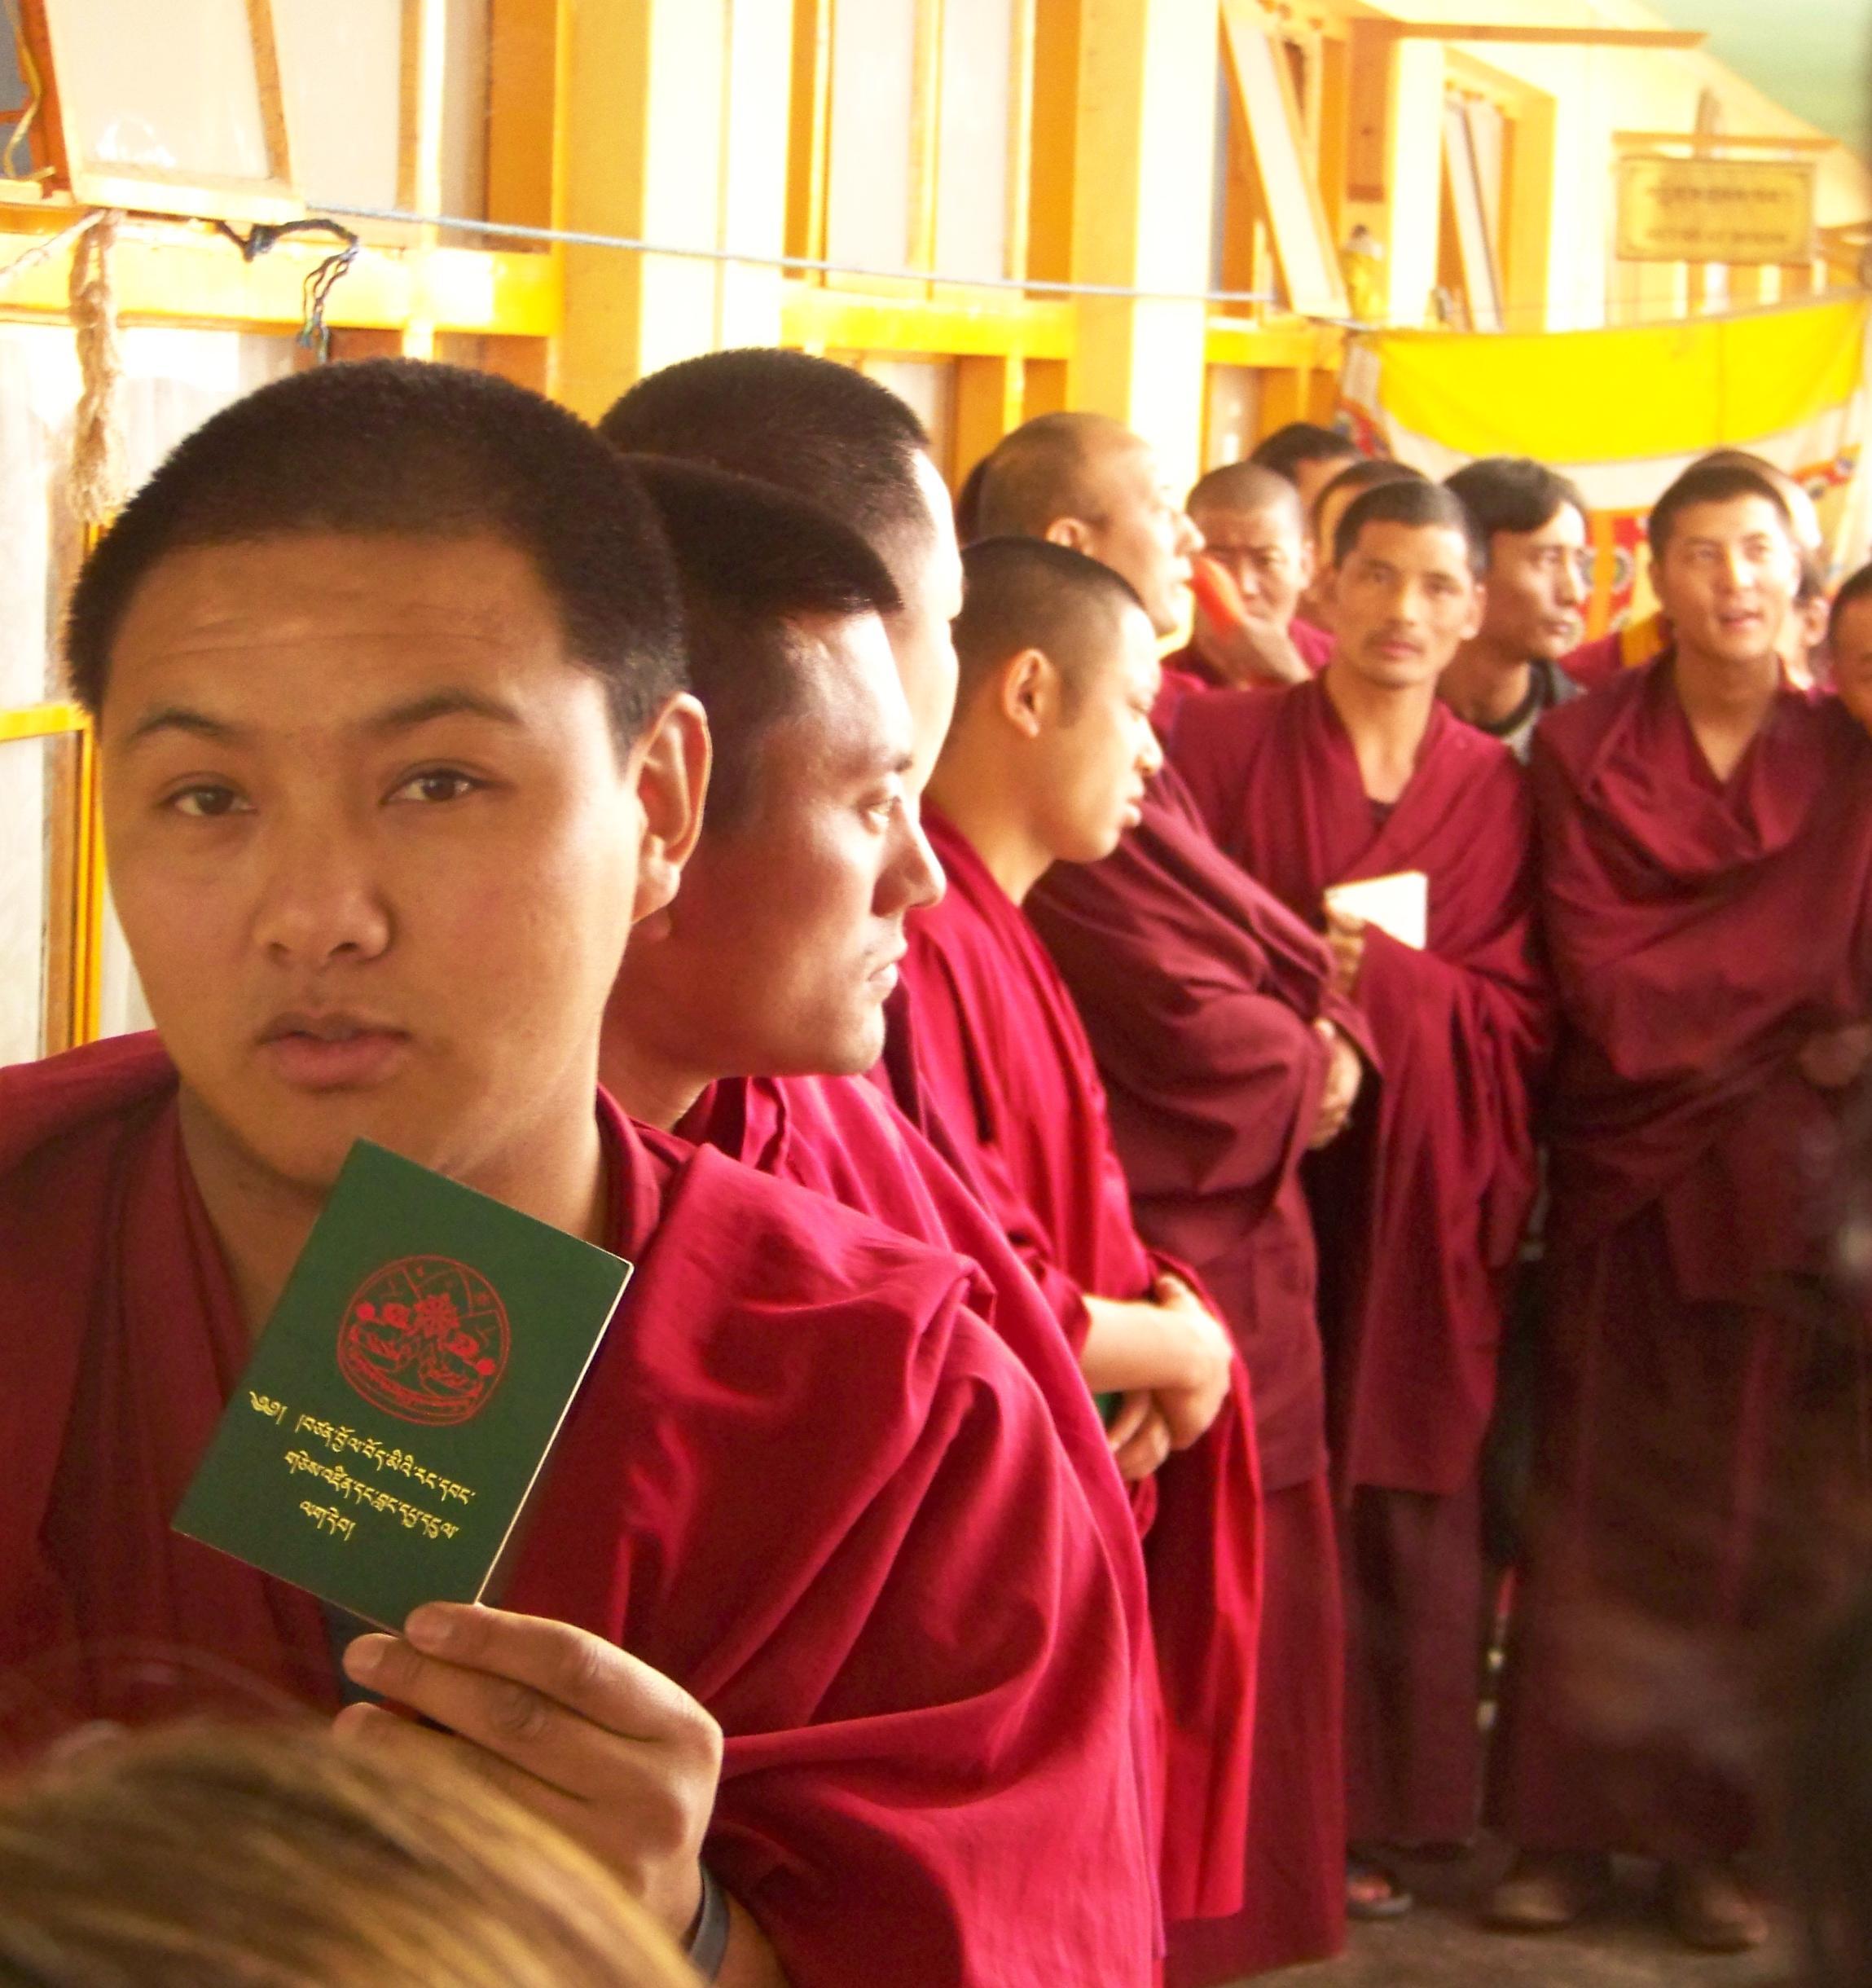 102_2339 Jonathan Machler, Tibétains à Dharamsala, Copyright